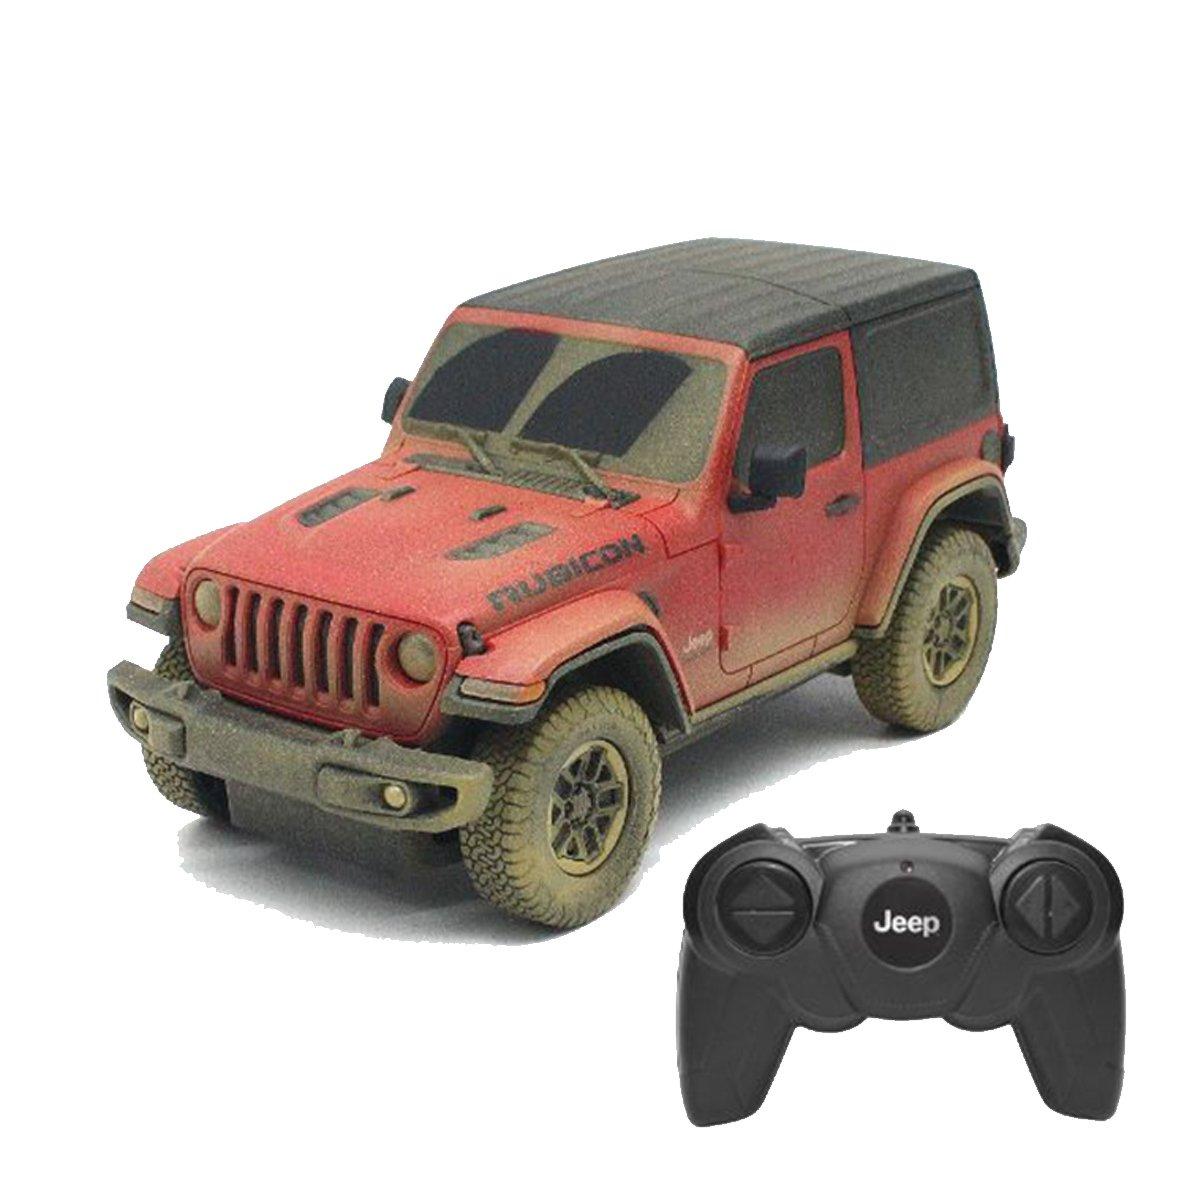 Masinuta cu telecomanda, Rastar, Jeep Wrangler Rubicon-Muddy Version, 1:24